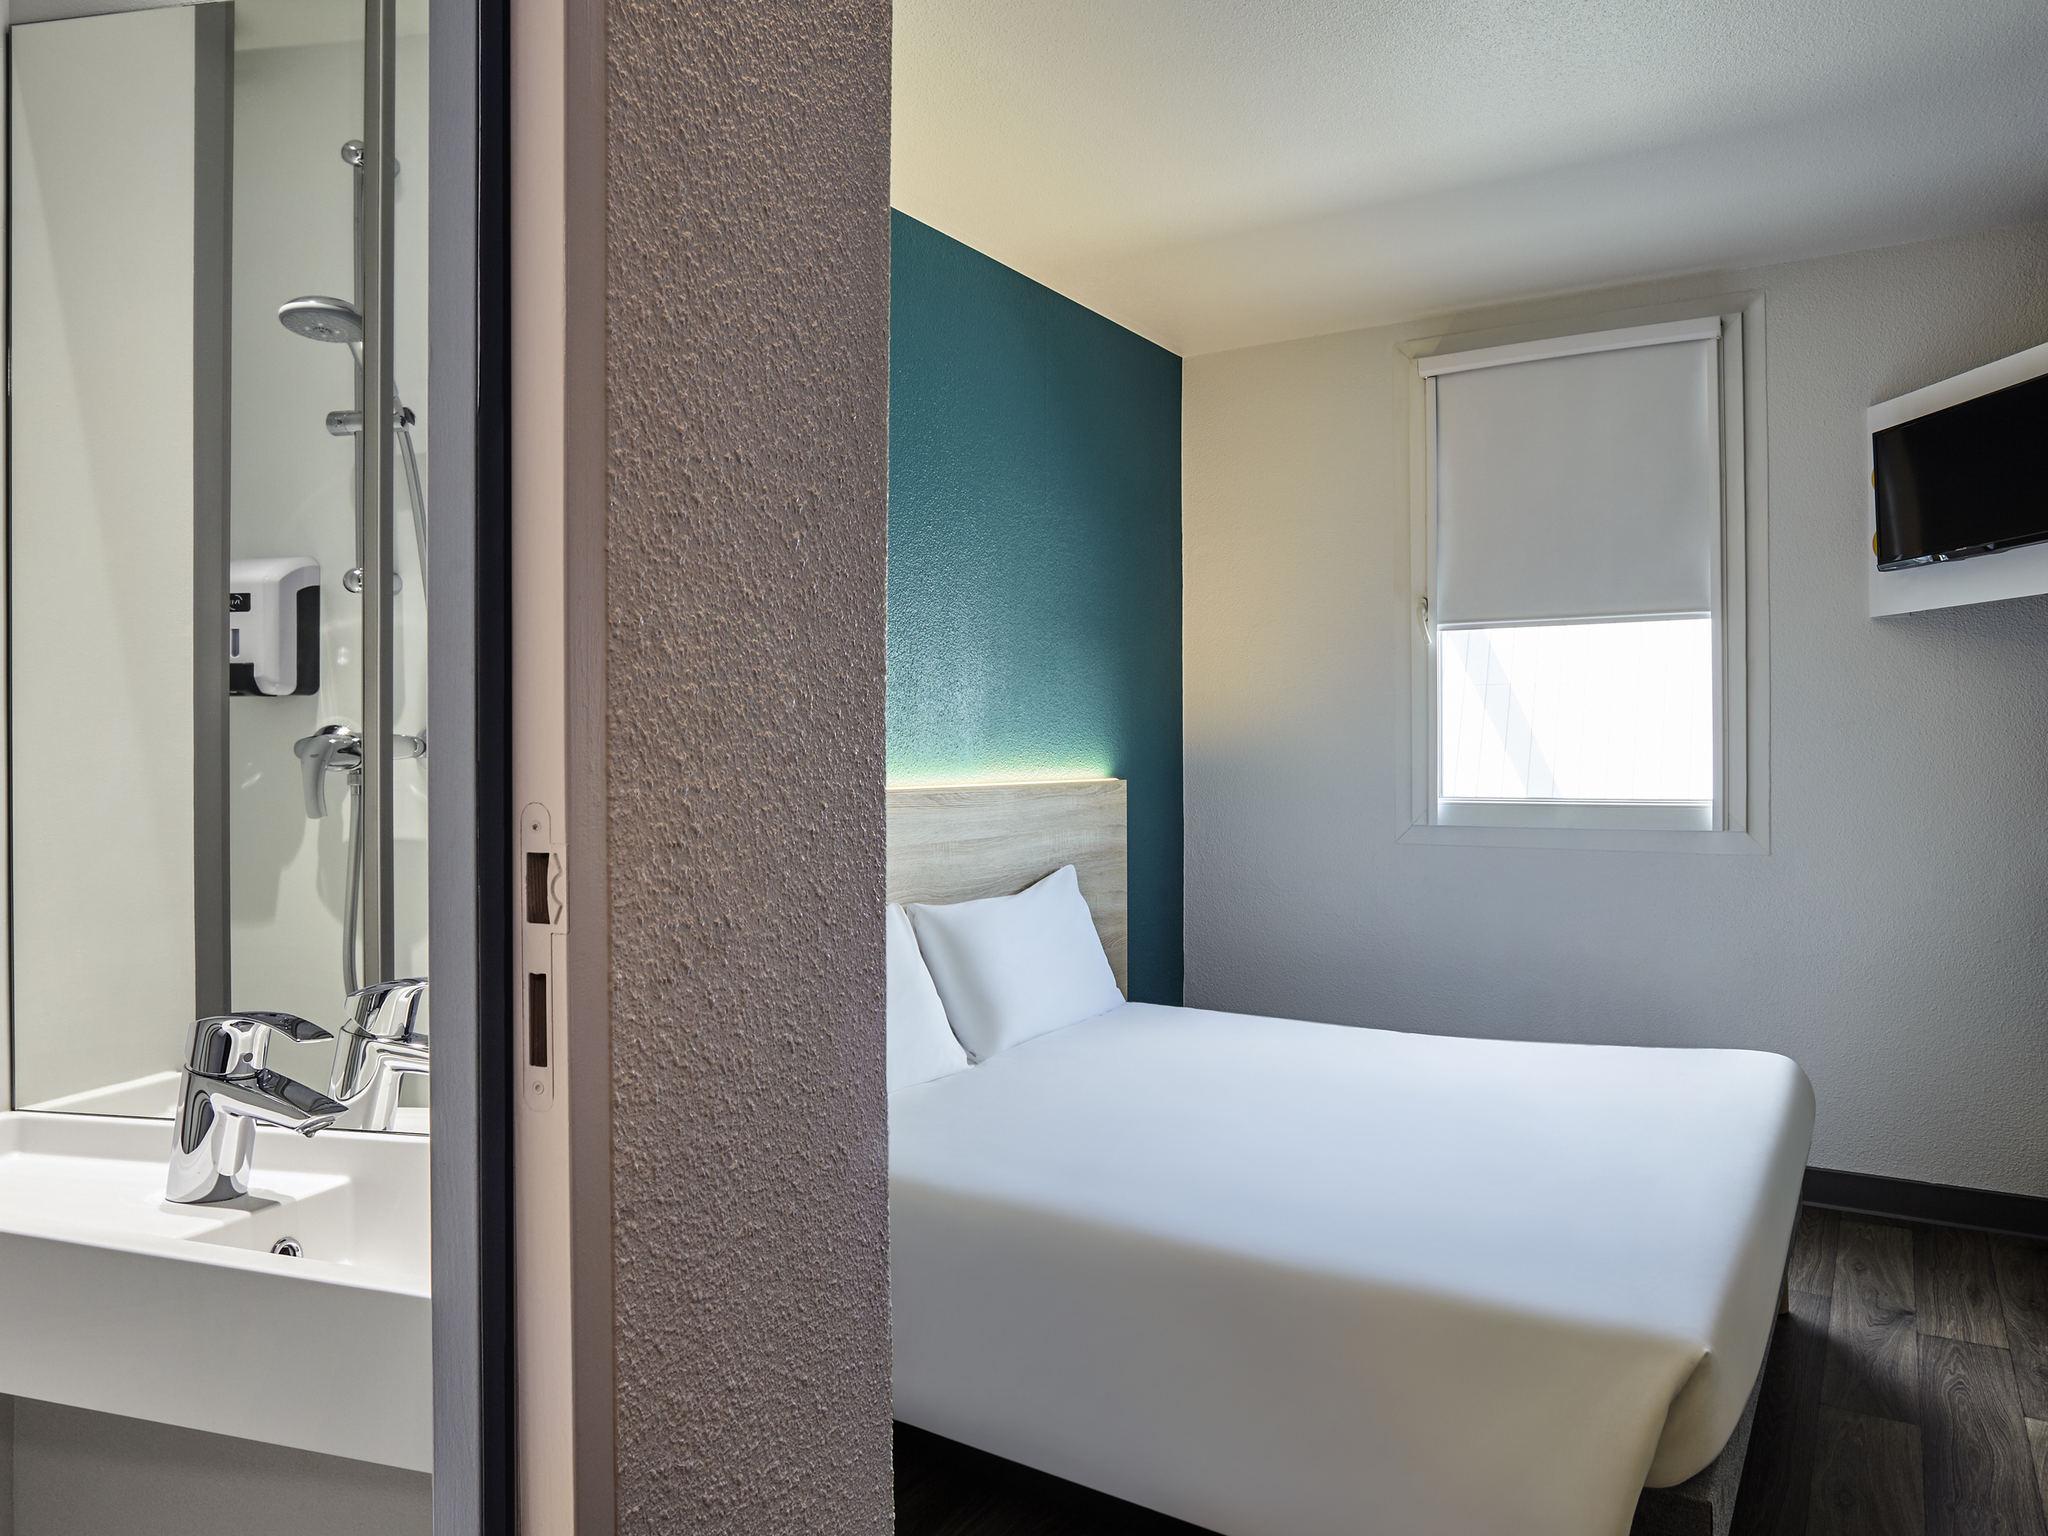 Отель — hotelF1 Strasbourg Pont de l'Europe (rénové)